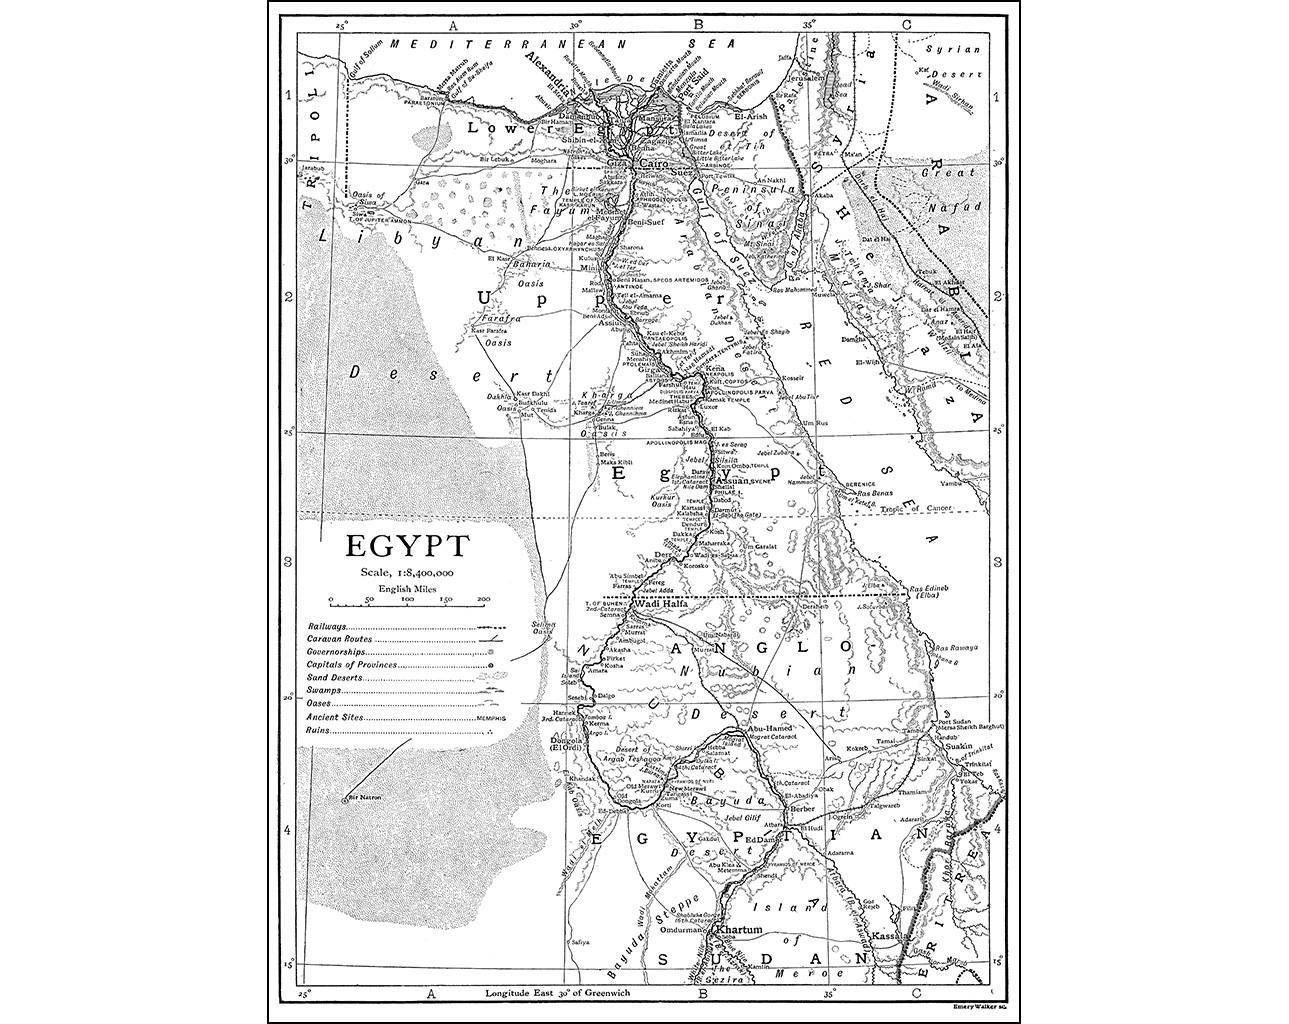 Alexandria Egypt World Map.Egypt Print Of Pre World War I Antique Map Monochrome On Photo